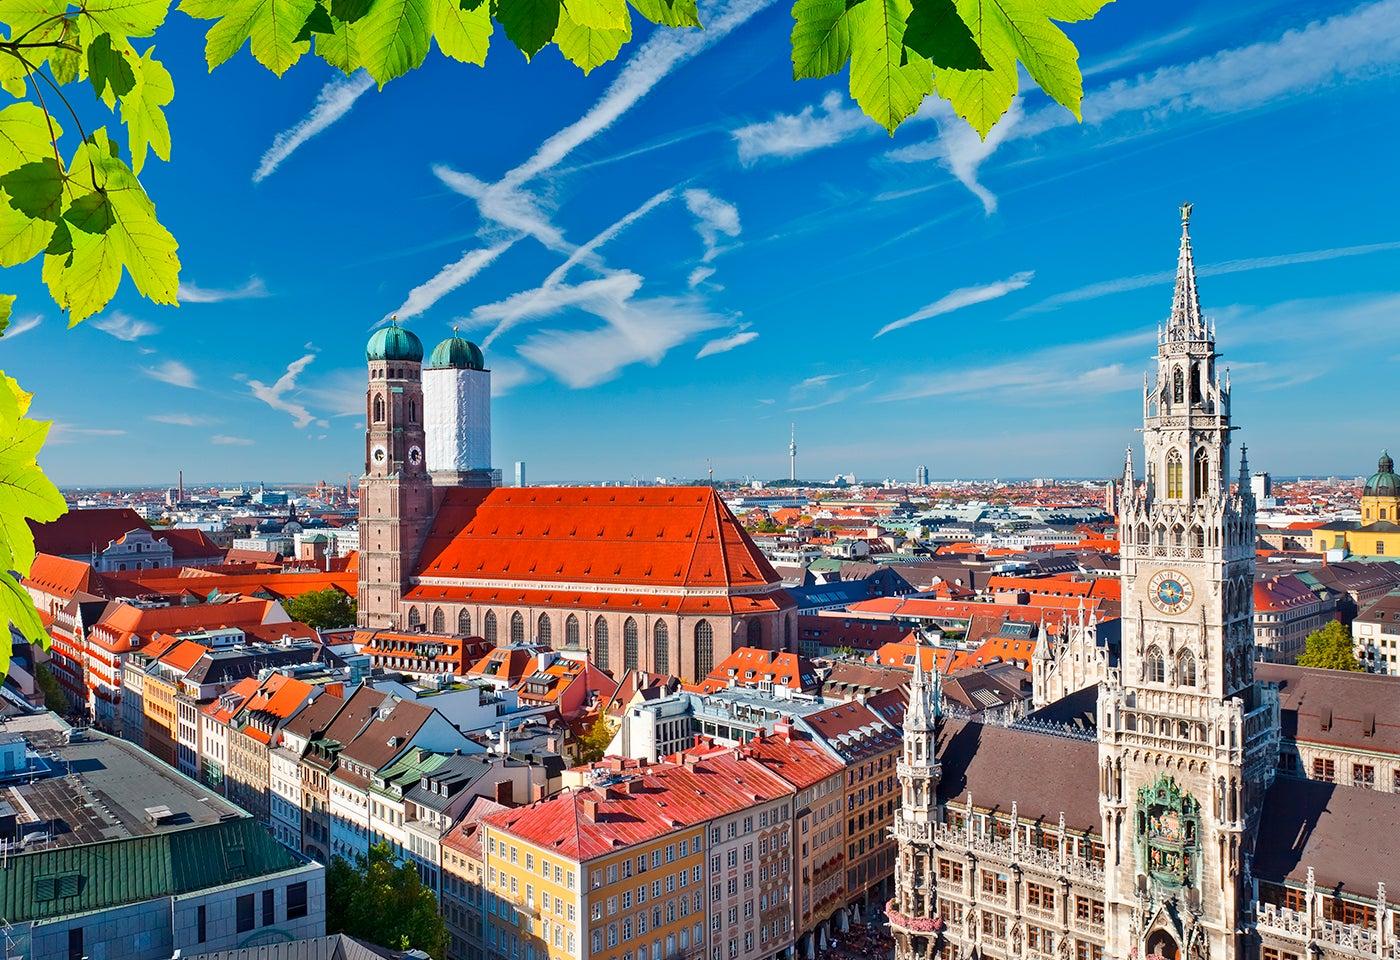 Ciudades alemanas, Múnich